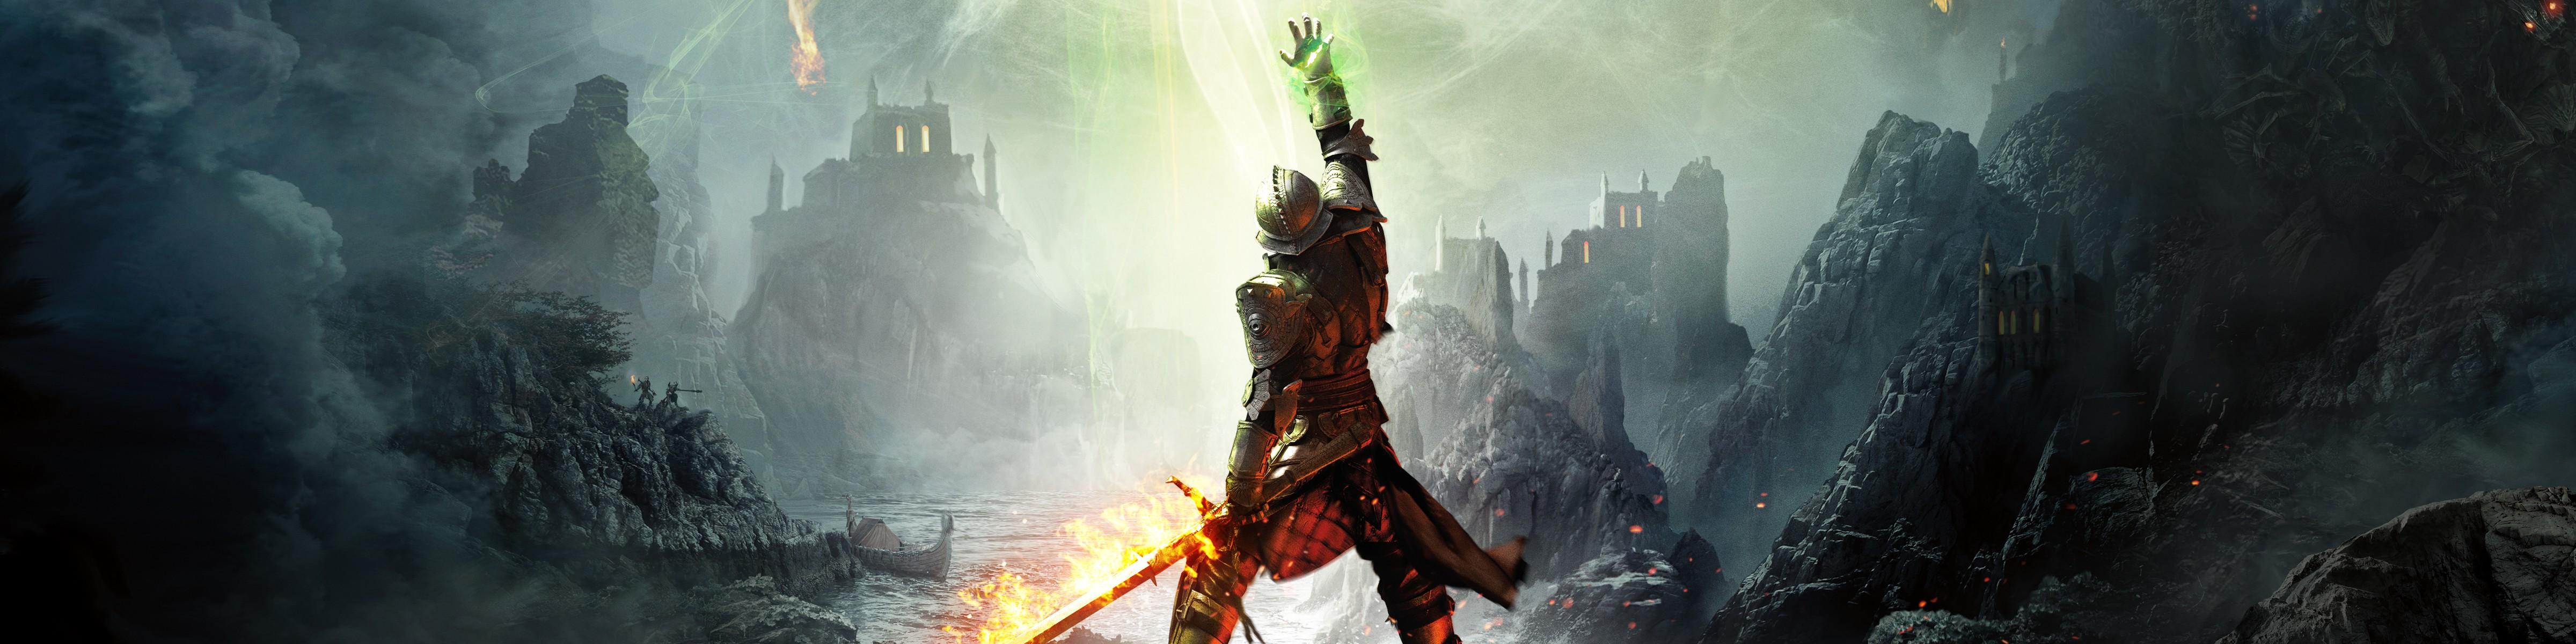 dragon-age-inquisition-english-voice-ove